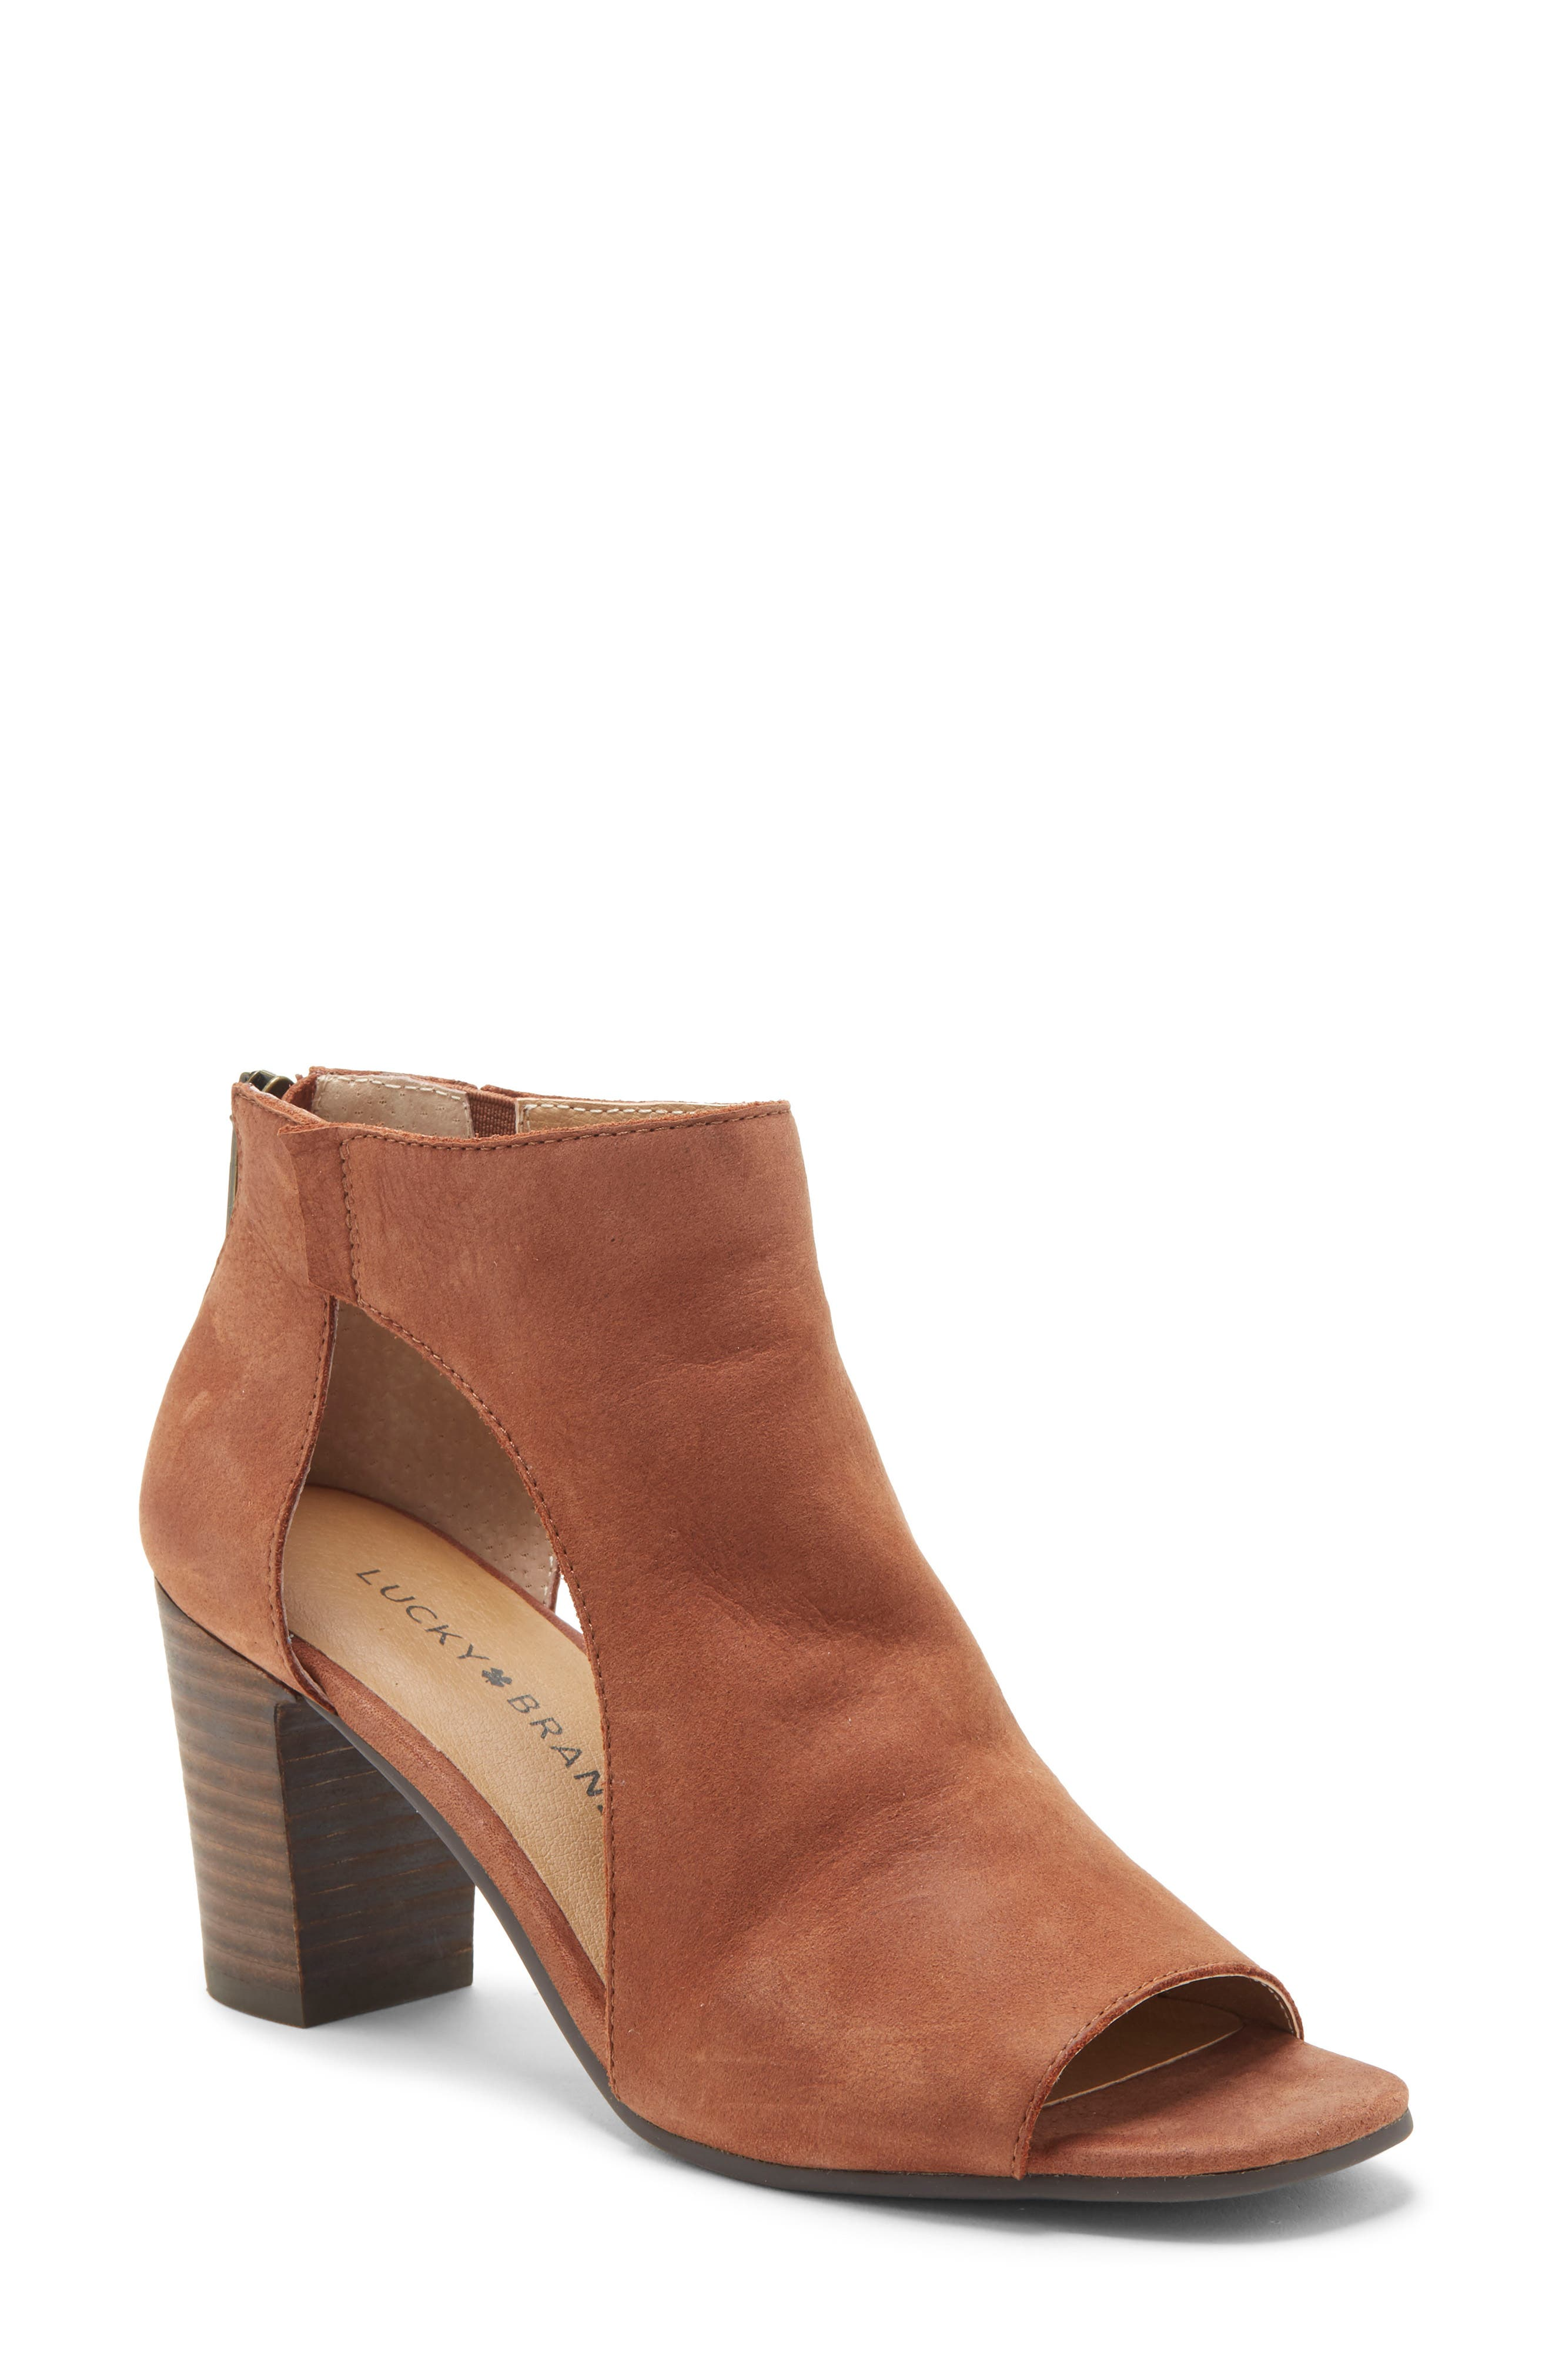 Lucky Brand Udine Shield Sandal, Beige